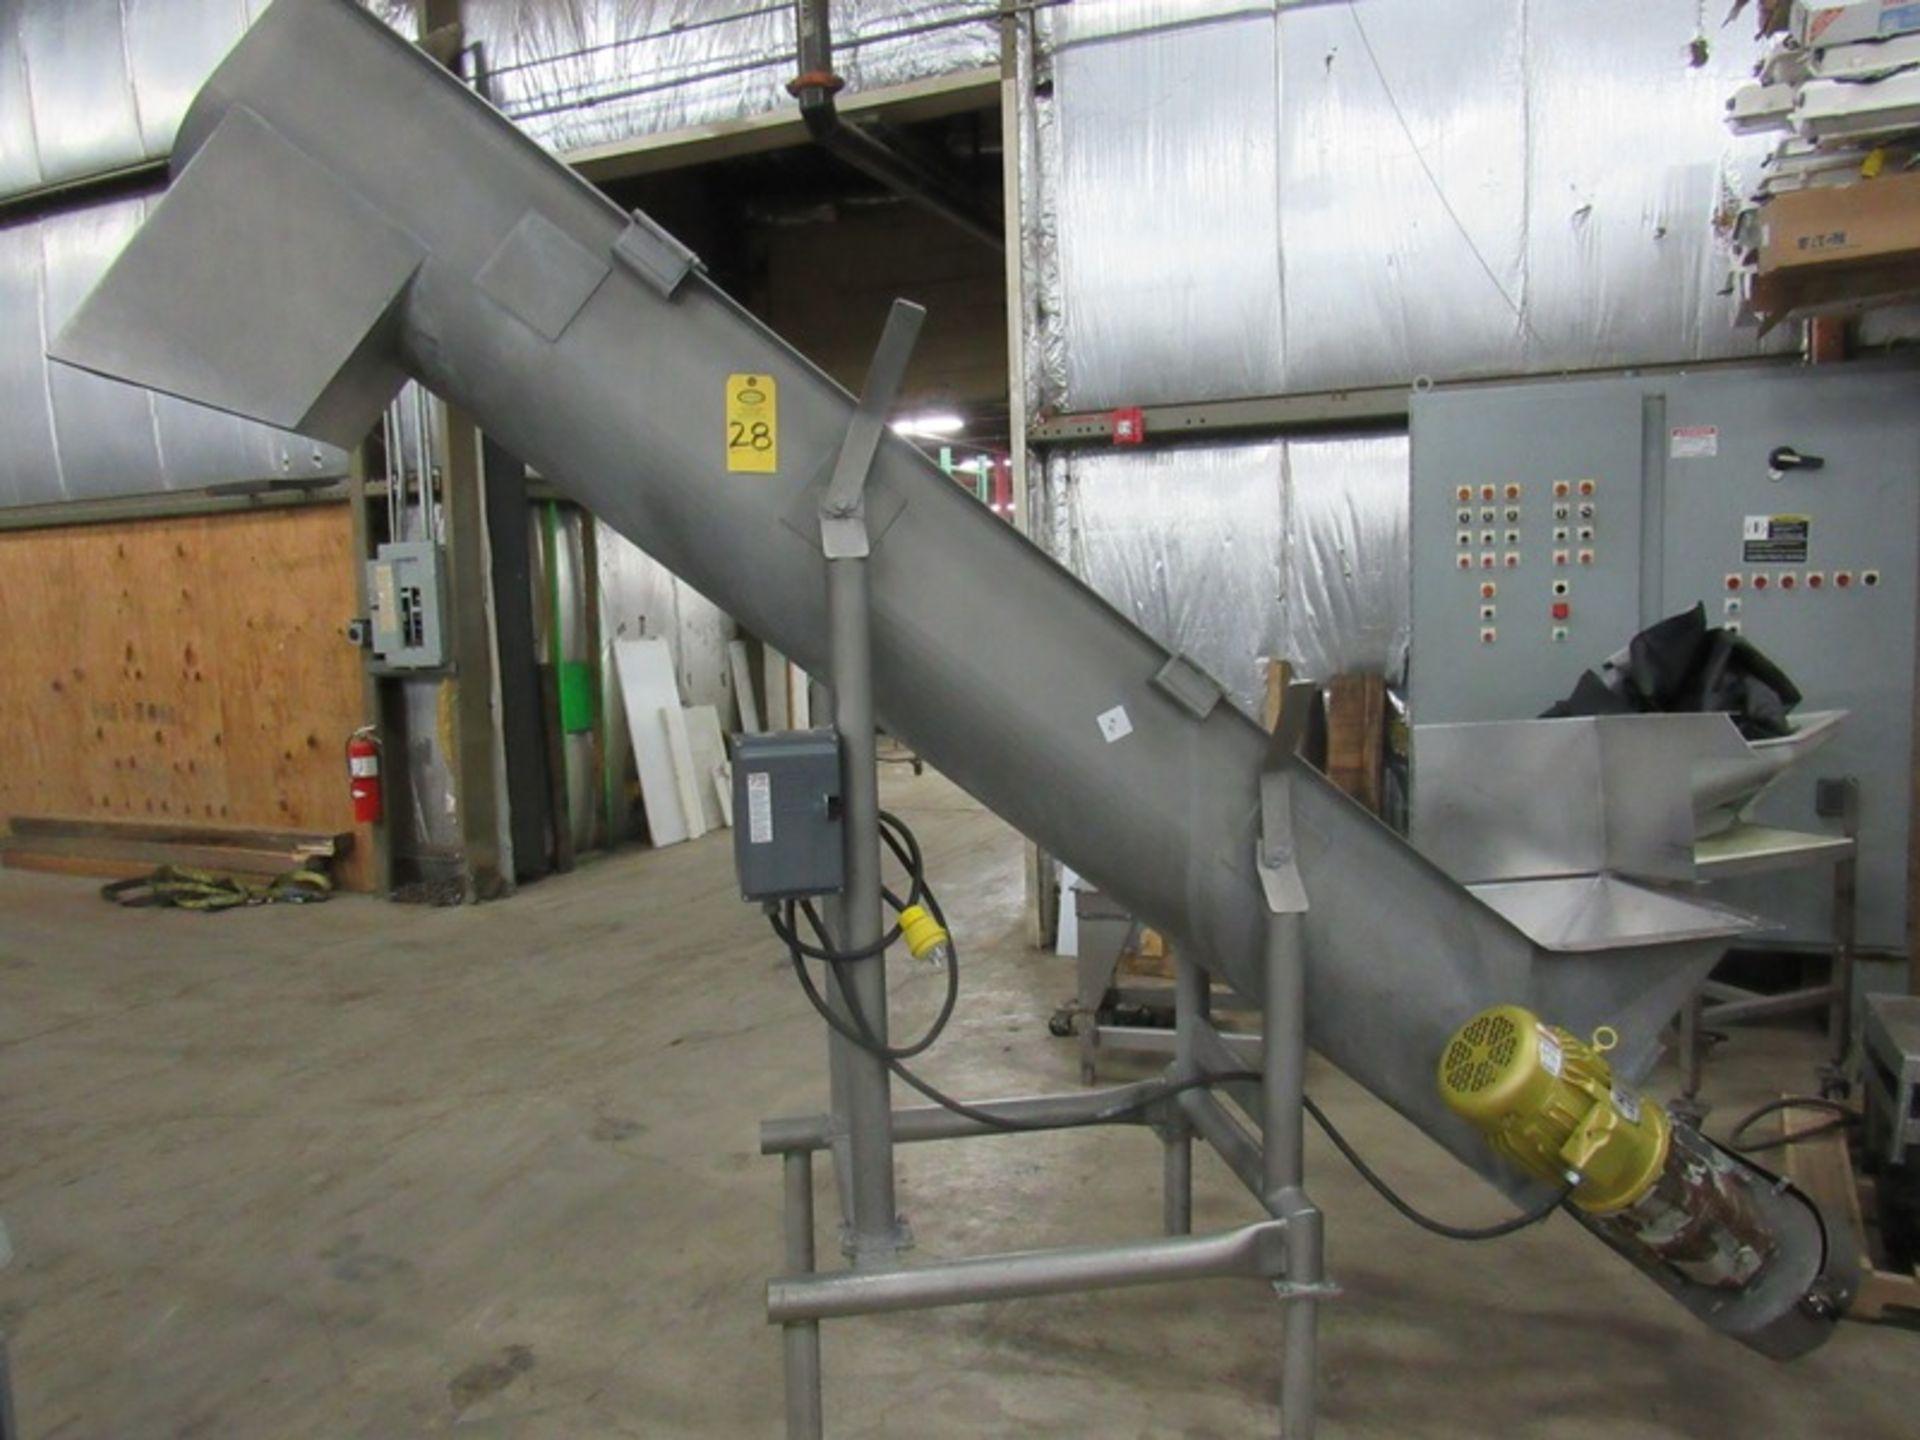 "Lot 28 - Stainless Steel Screw Conveyor, 14"" Dia. X 9' L screw, 6' discharge, stainless steel screw cover,"